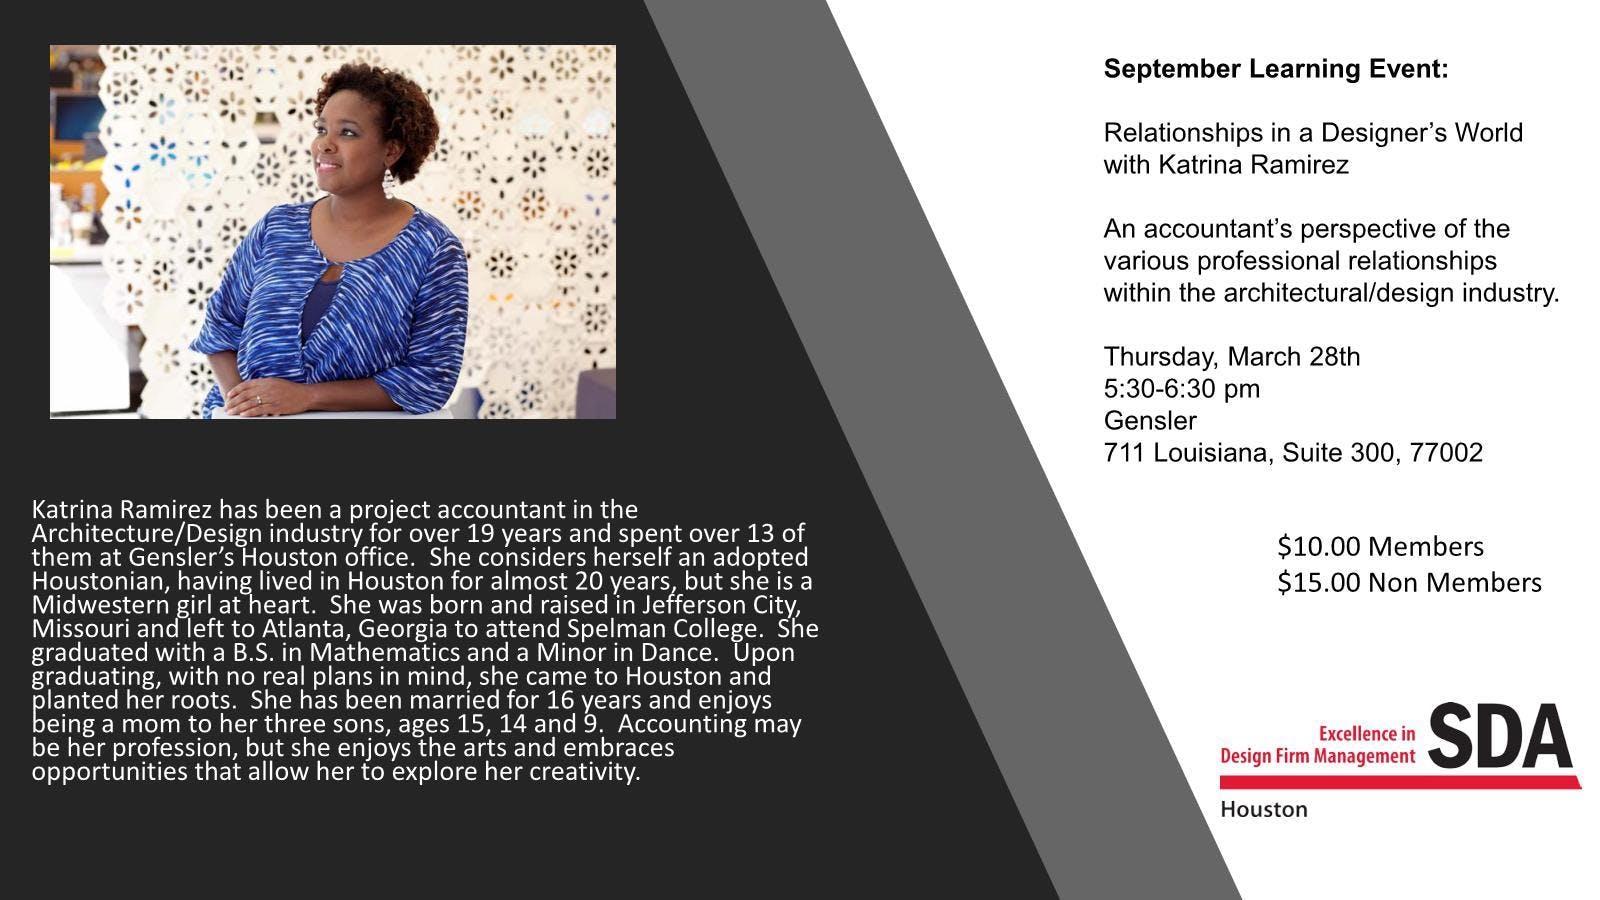 Relationships in a Designer's World with Katrina Ramirez